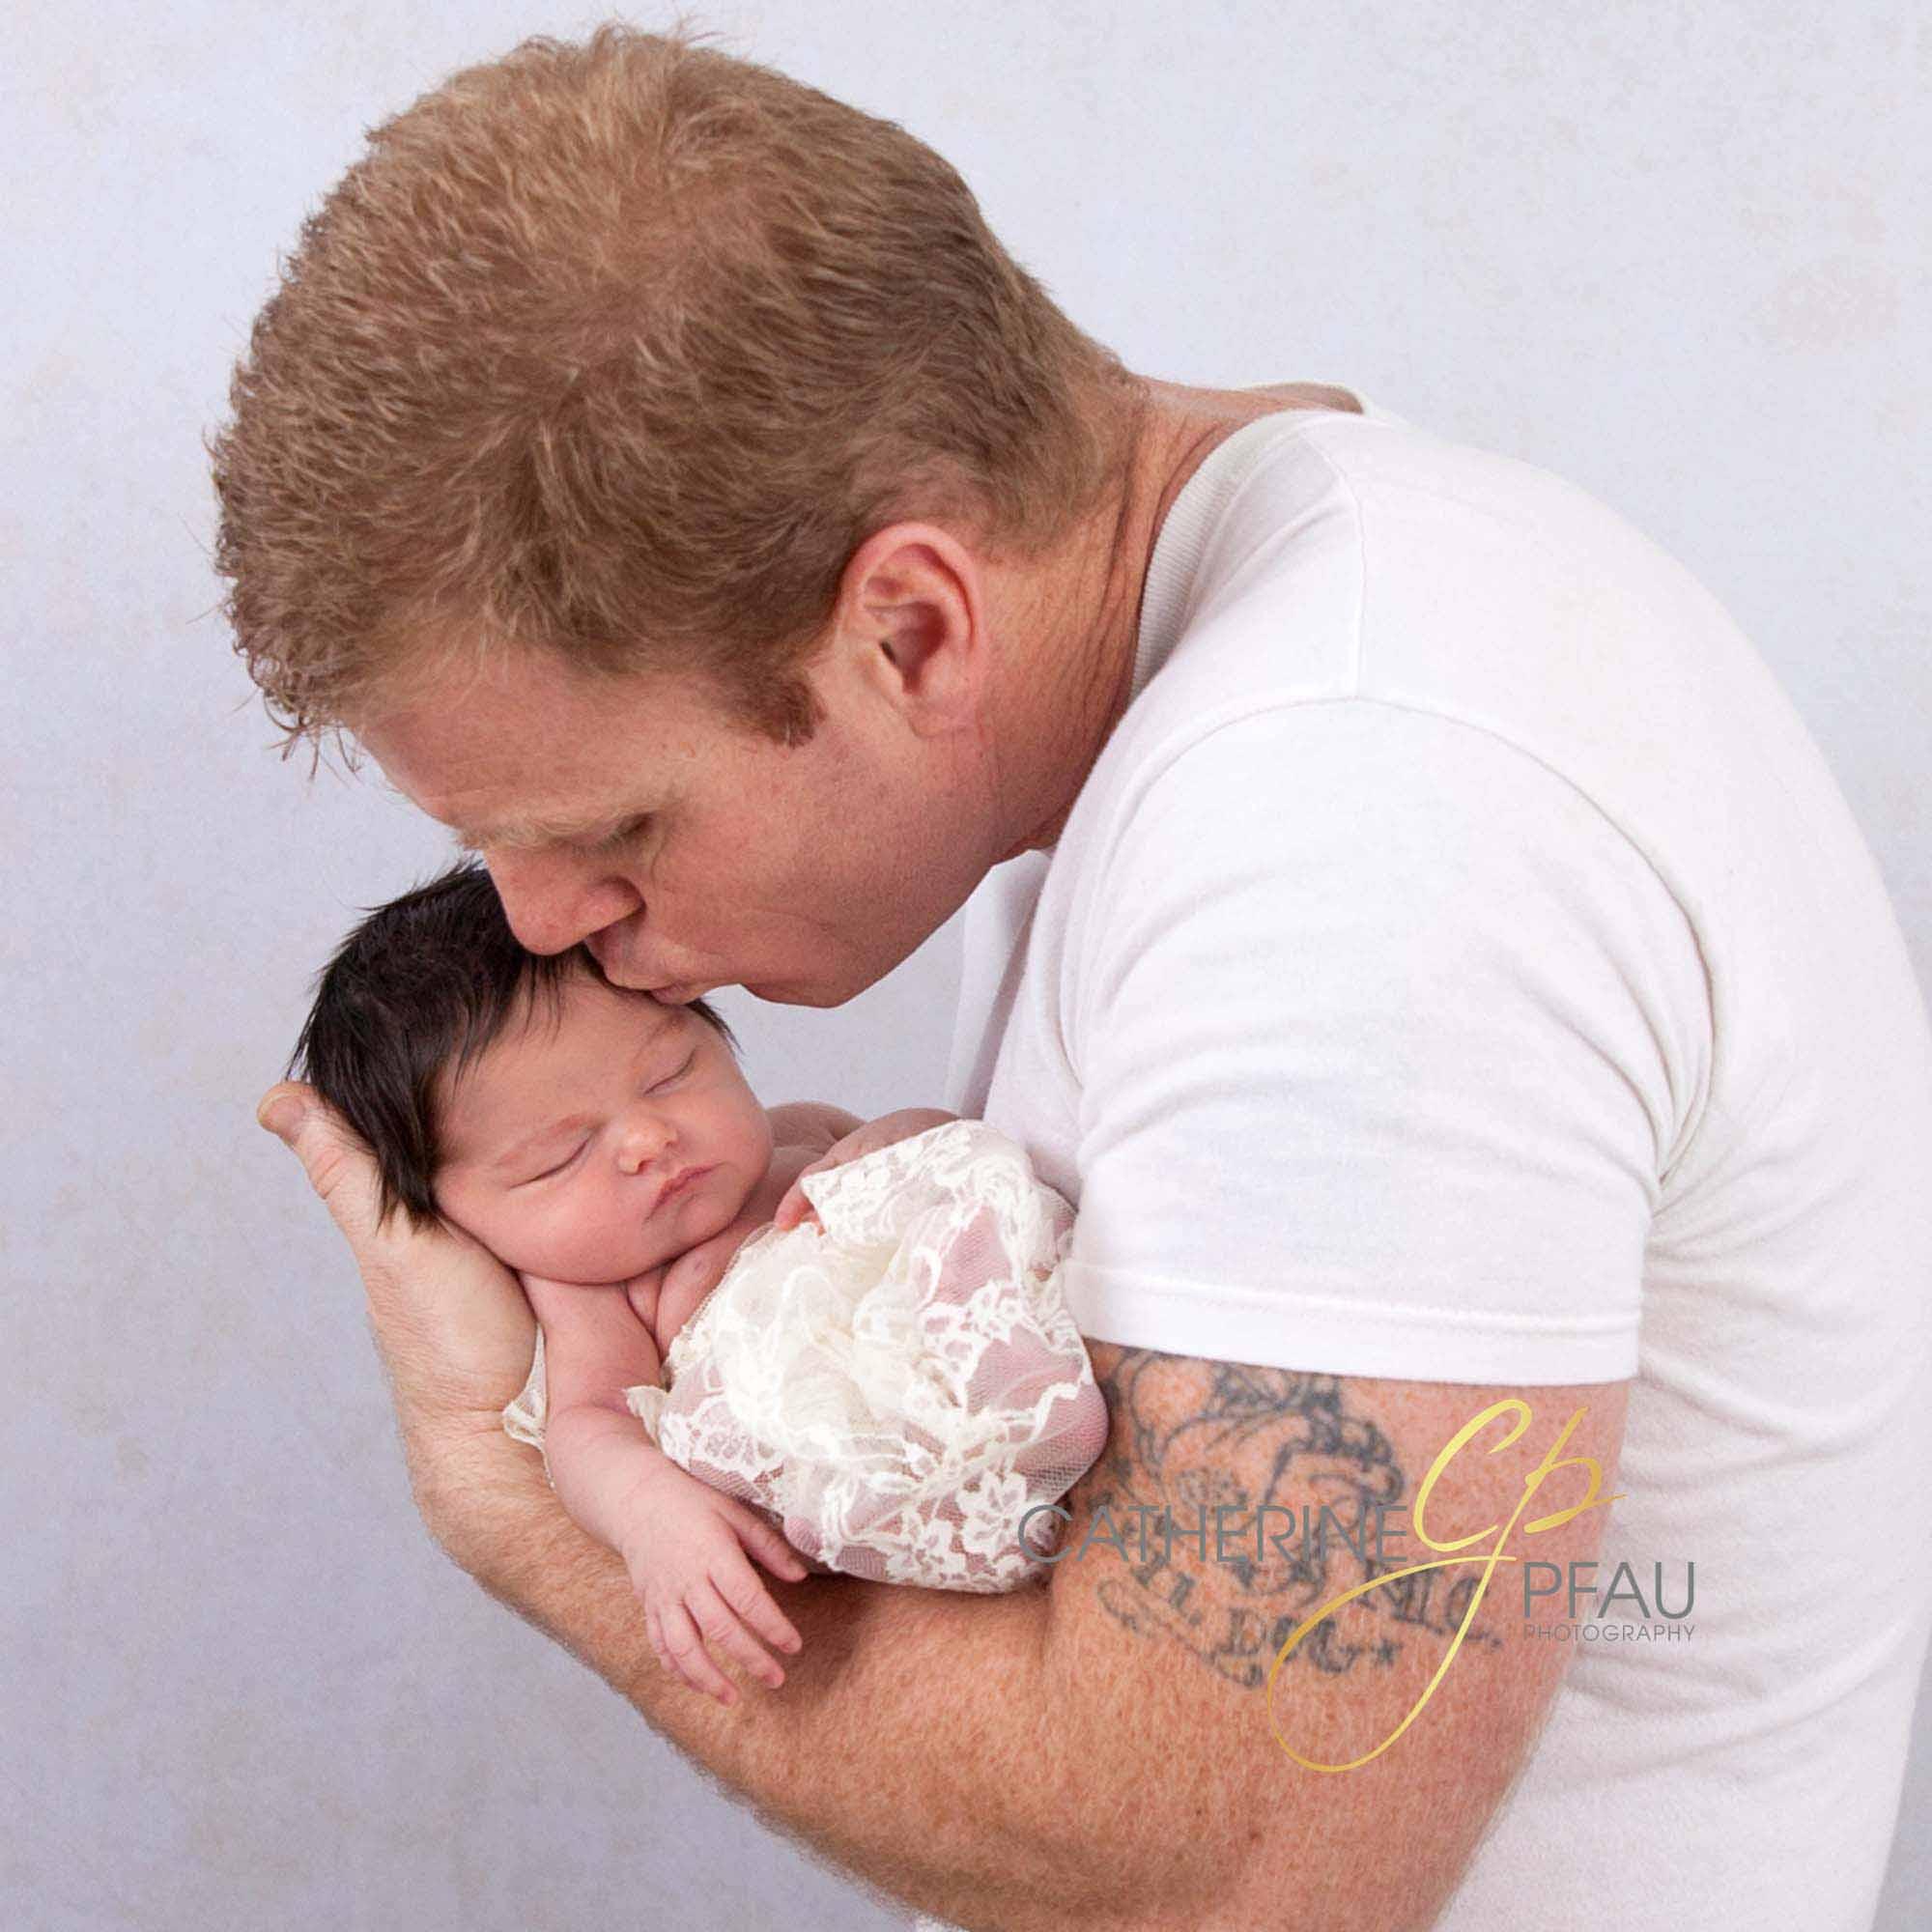 catherinepfauphotography_familyportrait_children_photography-6.jpg